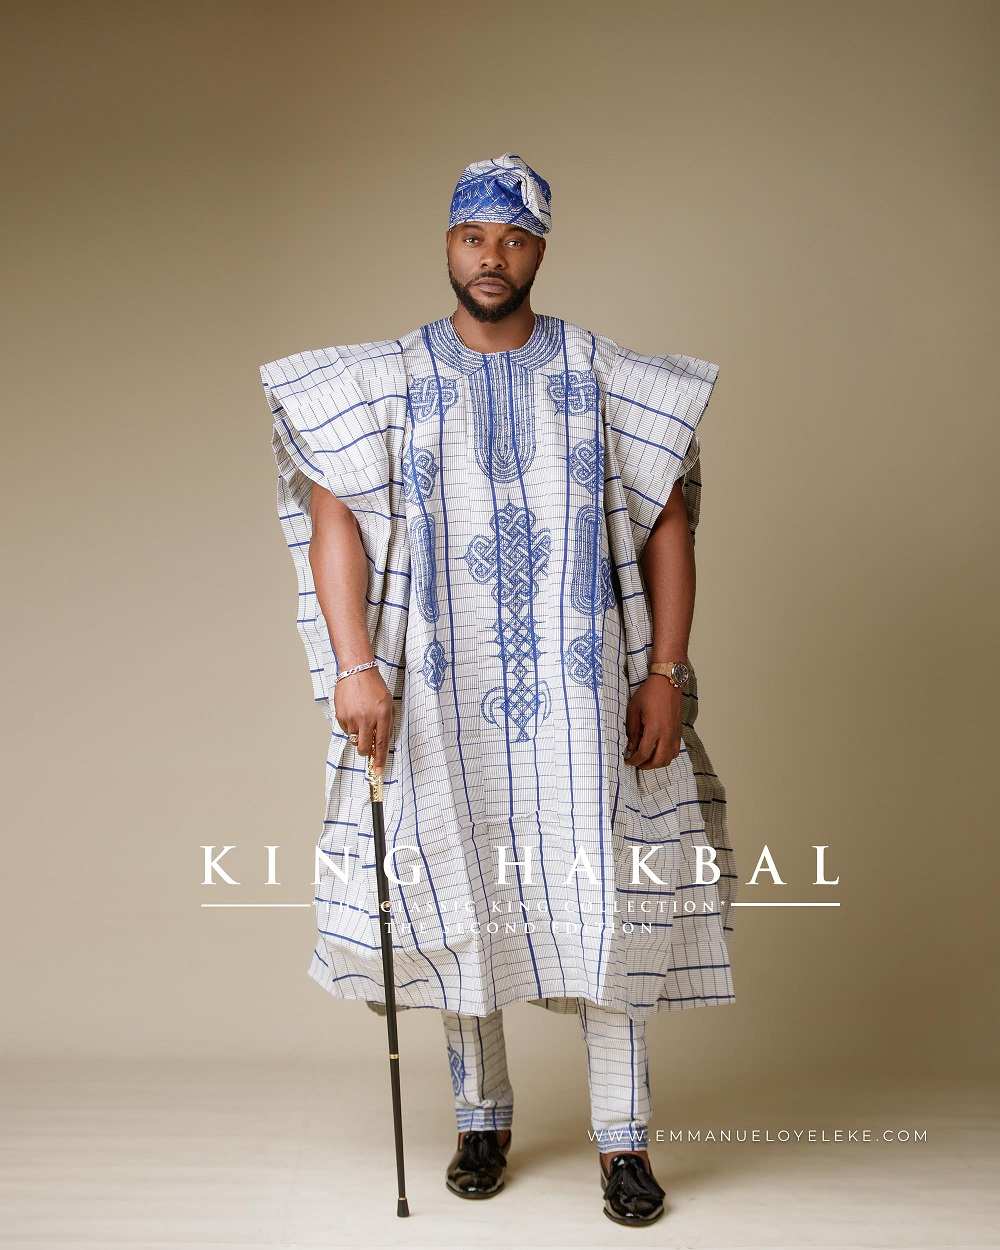 King Hakbal